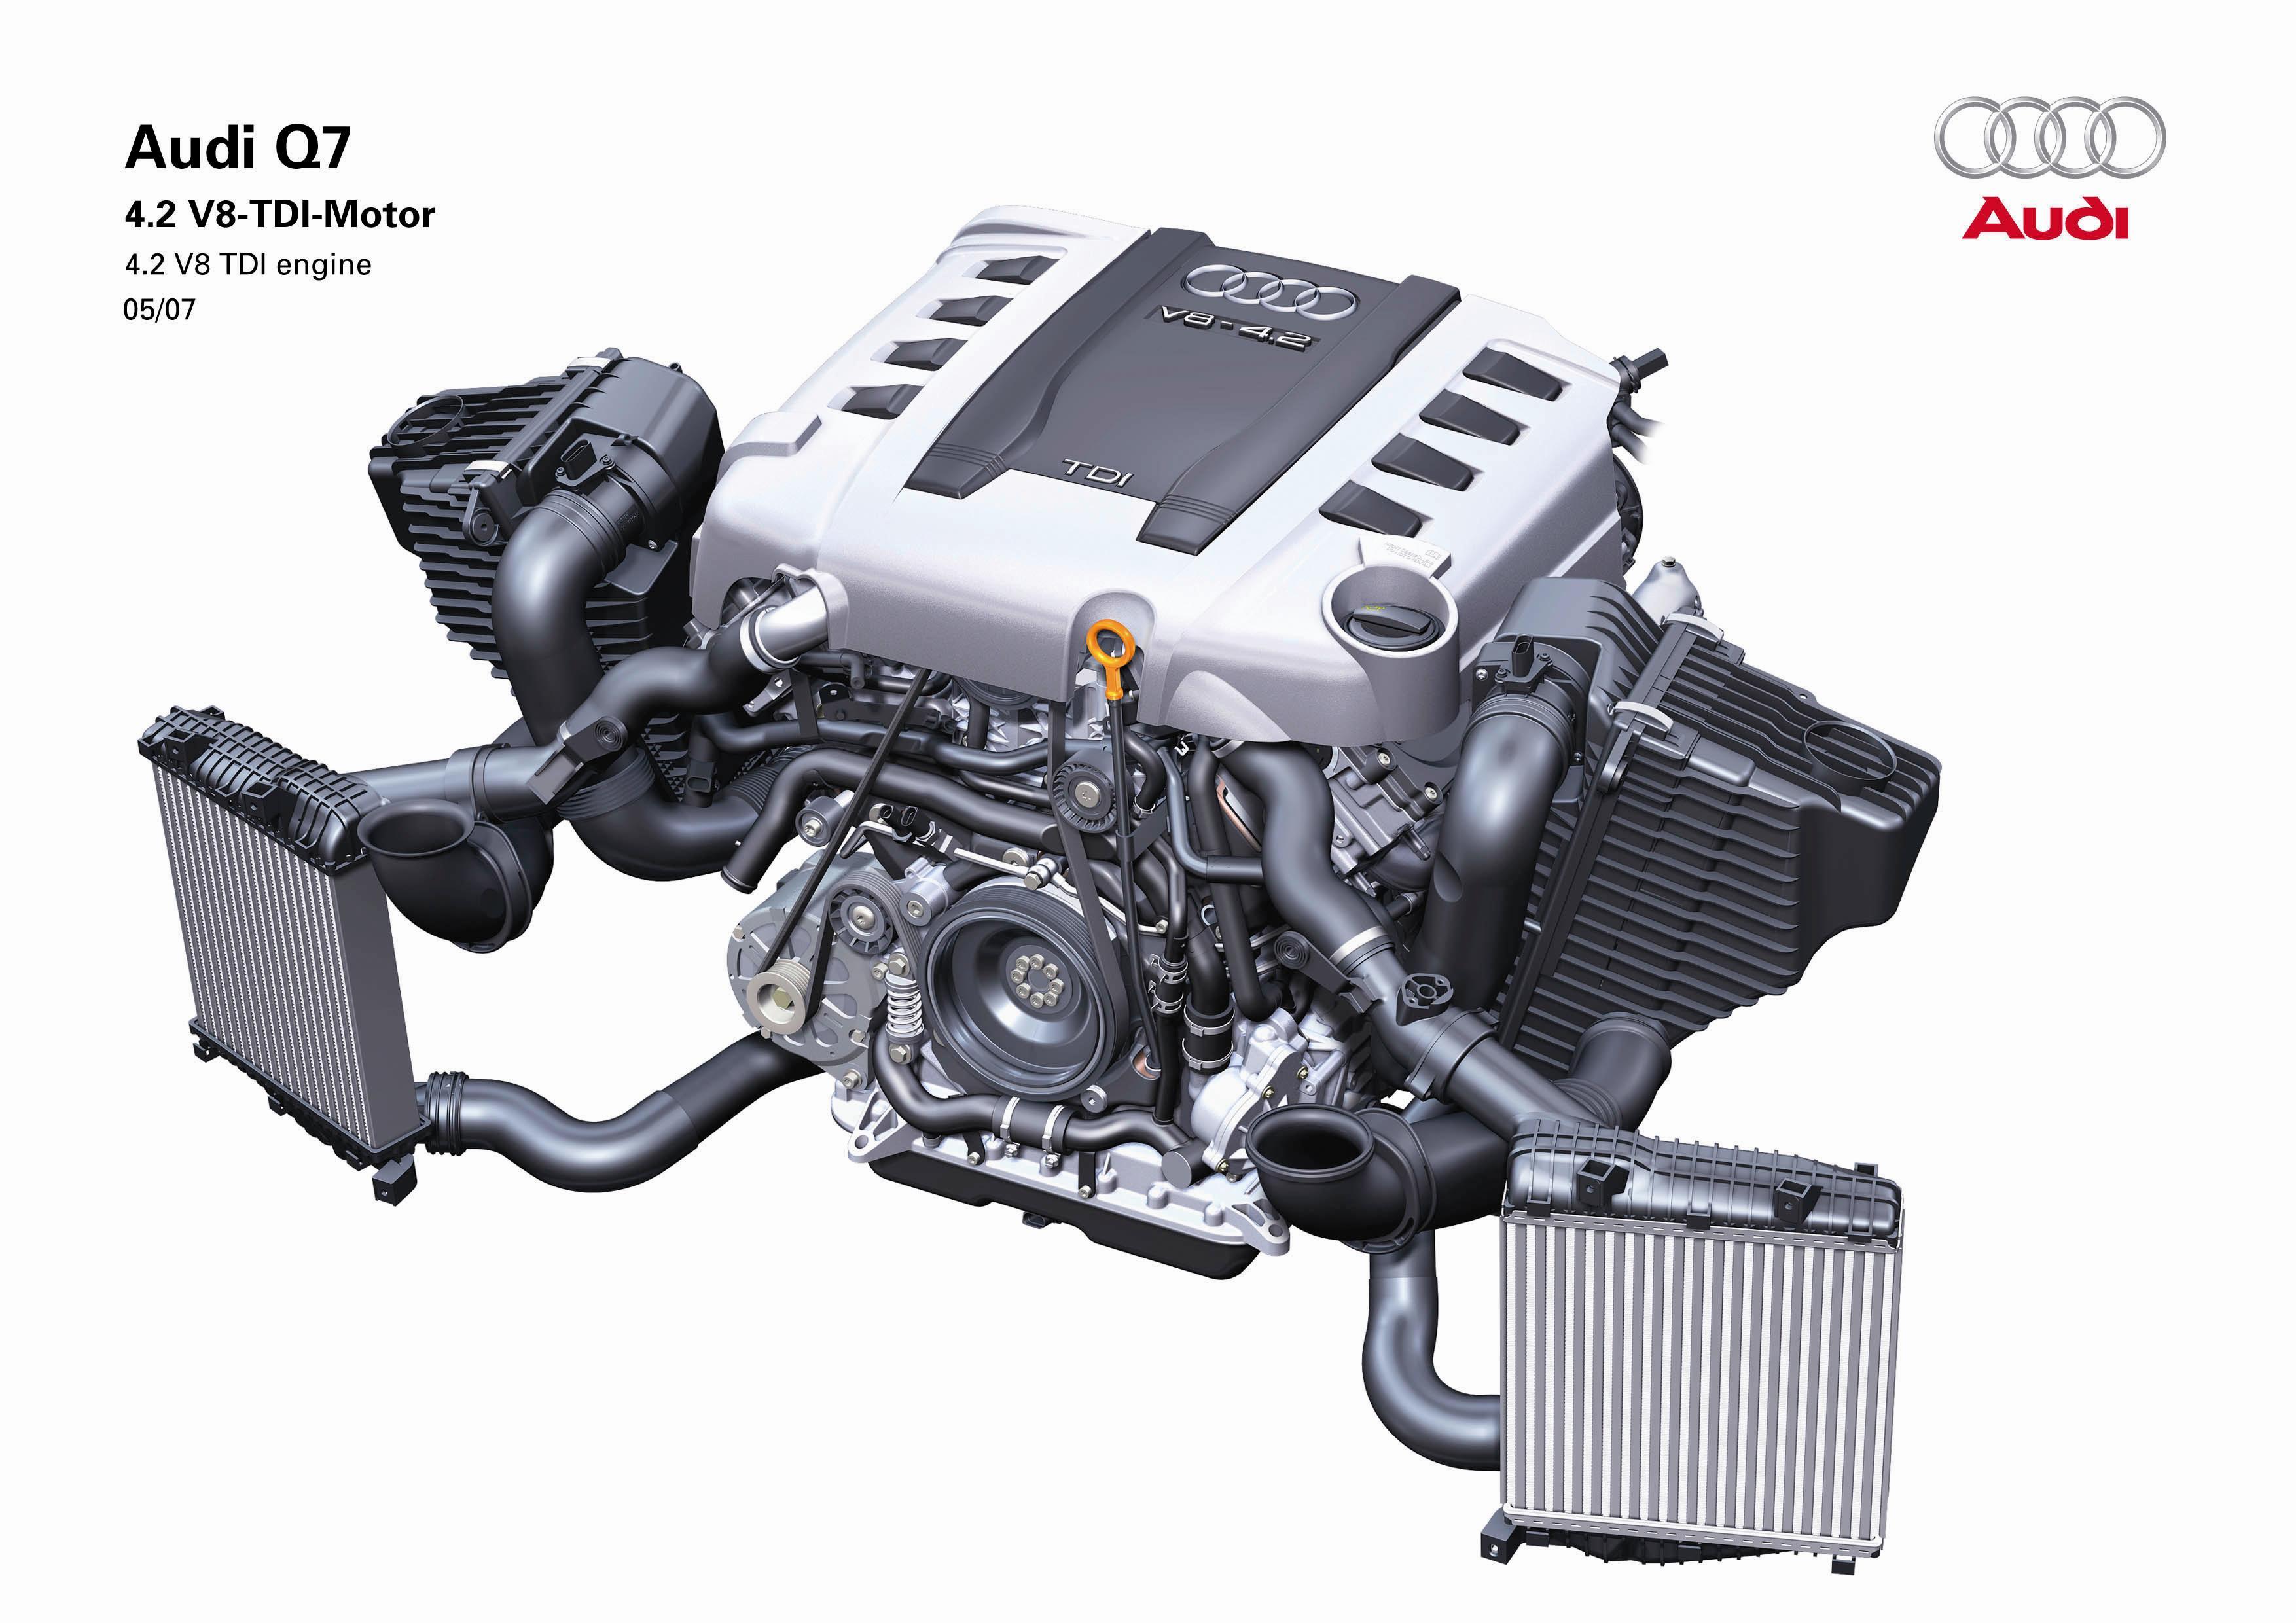 YN_0101] Audi V8 Engine Diagram View Diagram Audi A8 Engine Parts And  Schematic WiringTivexi Tomy Wazos Xolia Gram Stre Hyedi Mohammedshrine Librar Wiring 101